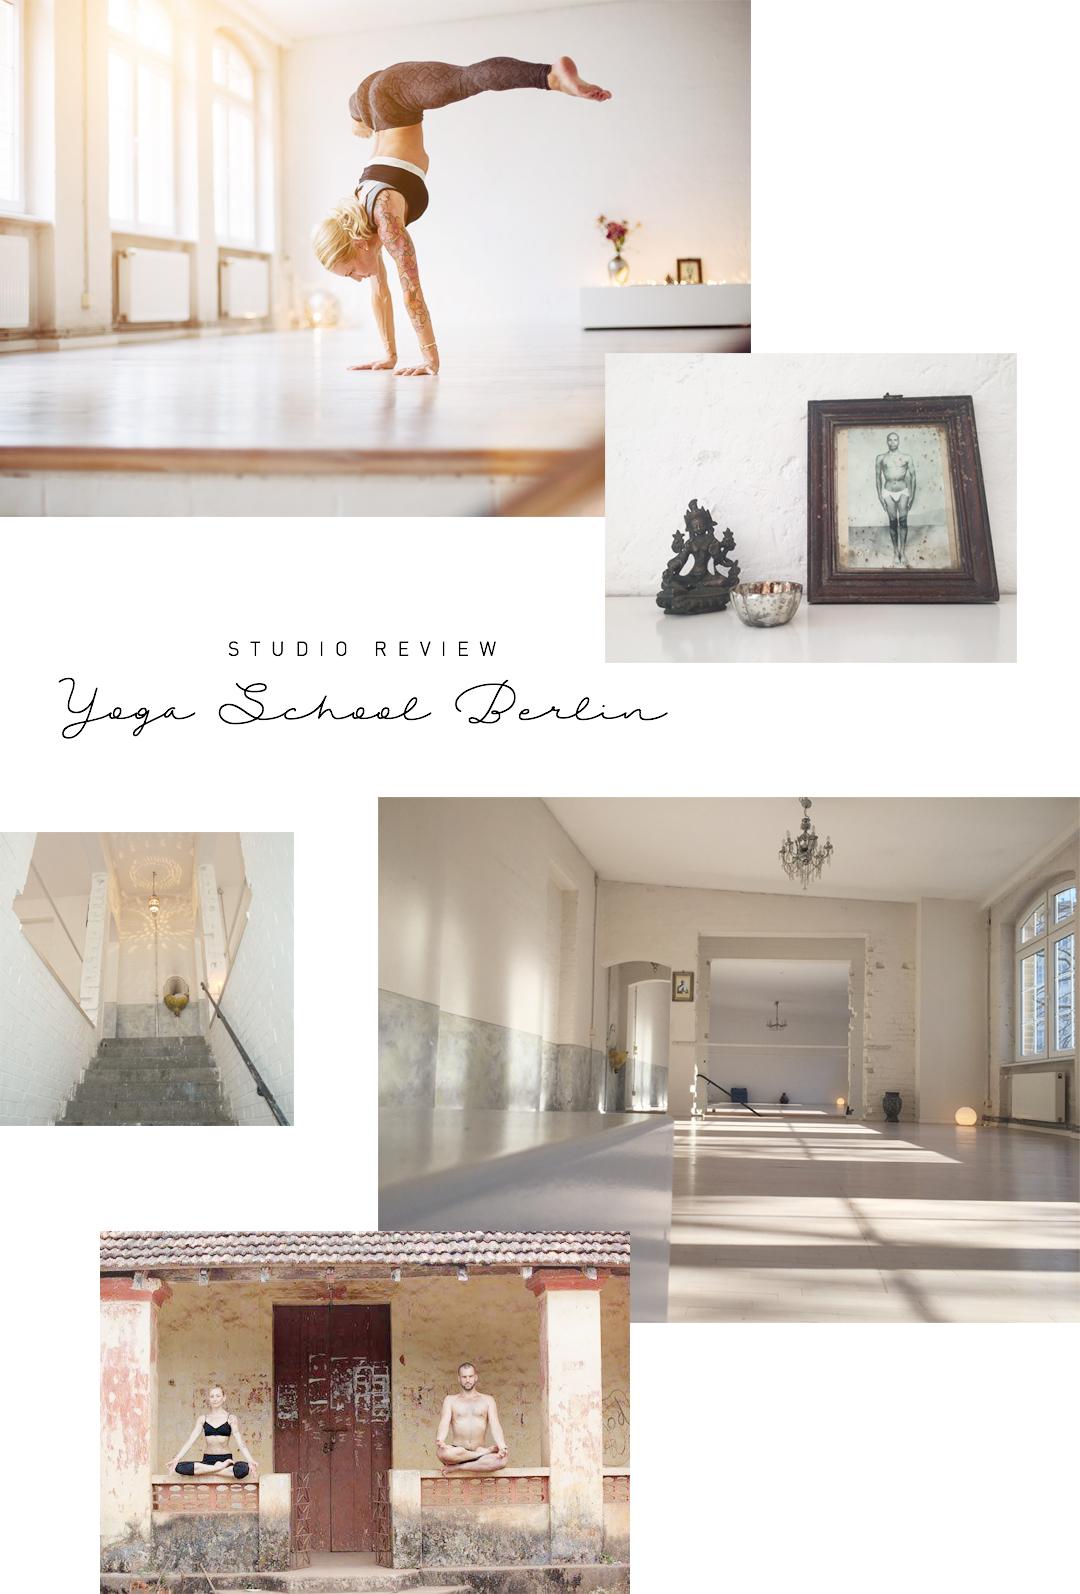 Yoga School Berlin Studio Review Ashtanga Yin Vinyasa Flow Yoga Kreuzberg Neukölln Deutschland Susen André Pijur